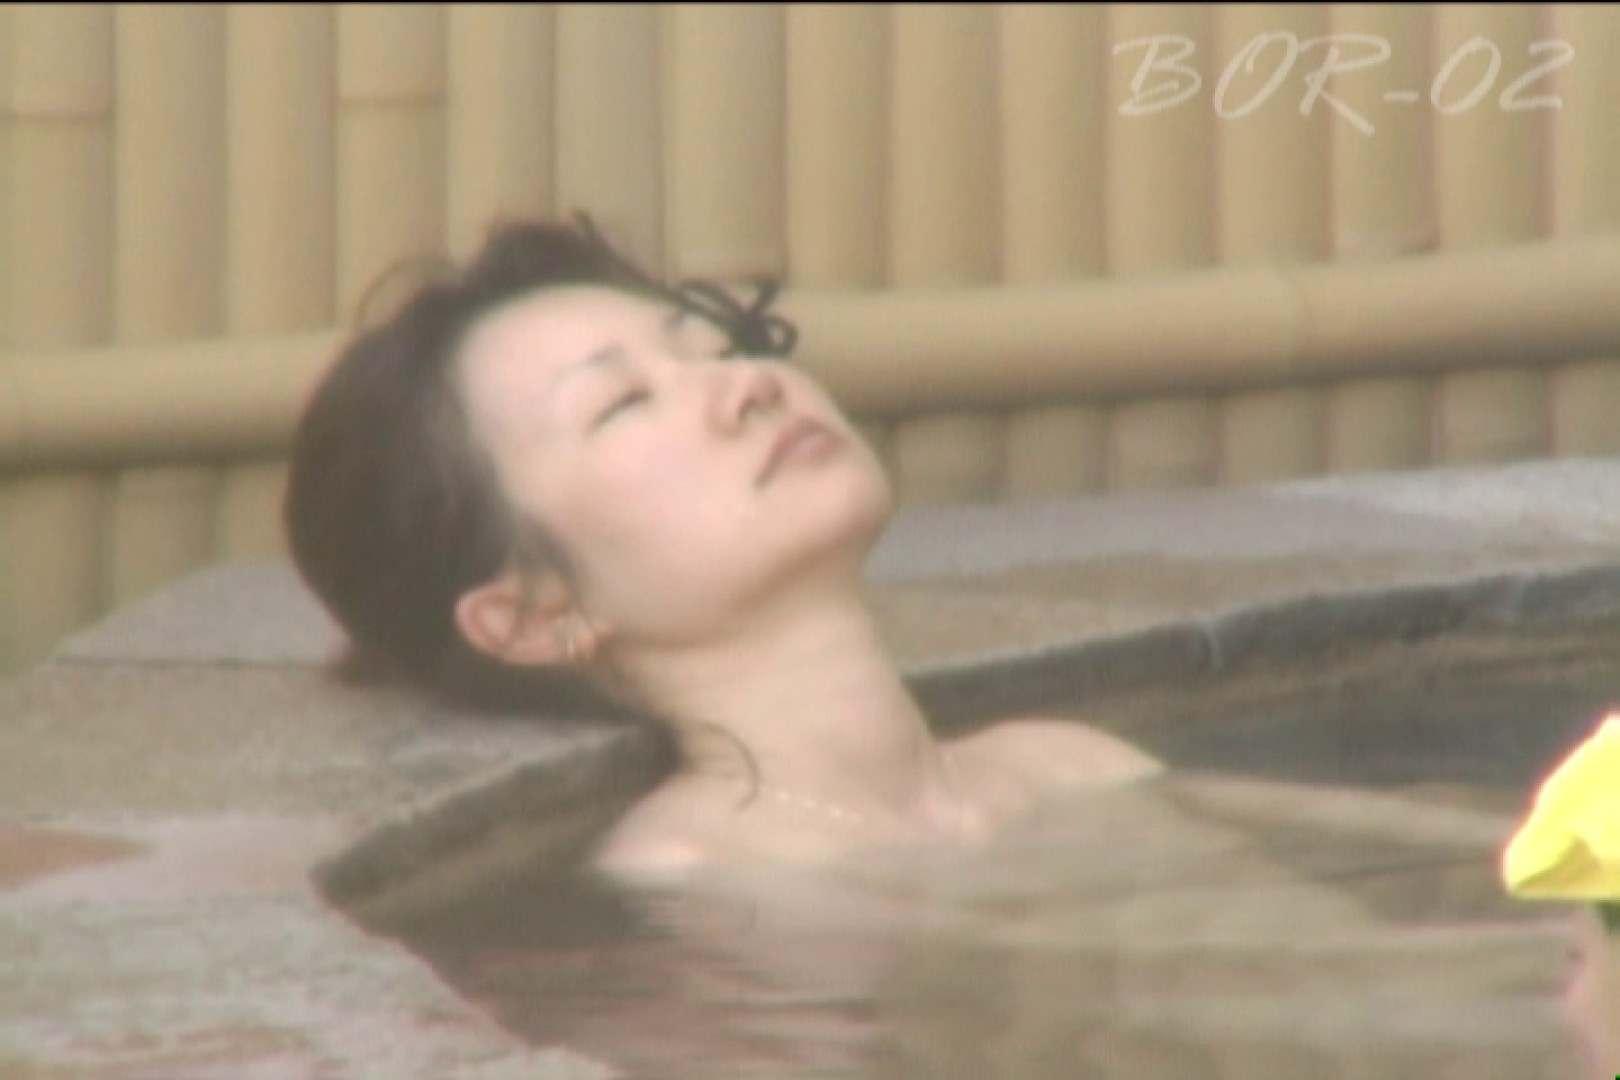 Aquaな露天風呂Vol.477 OLセックス 盗撮われめAV動画紹介 86画像 38